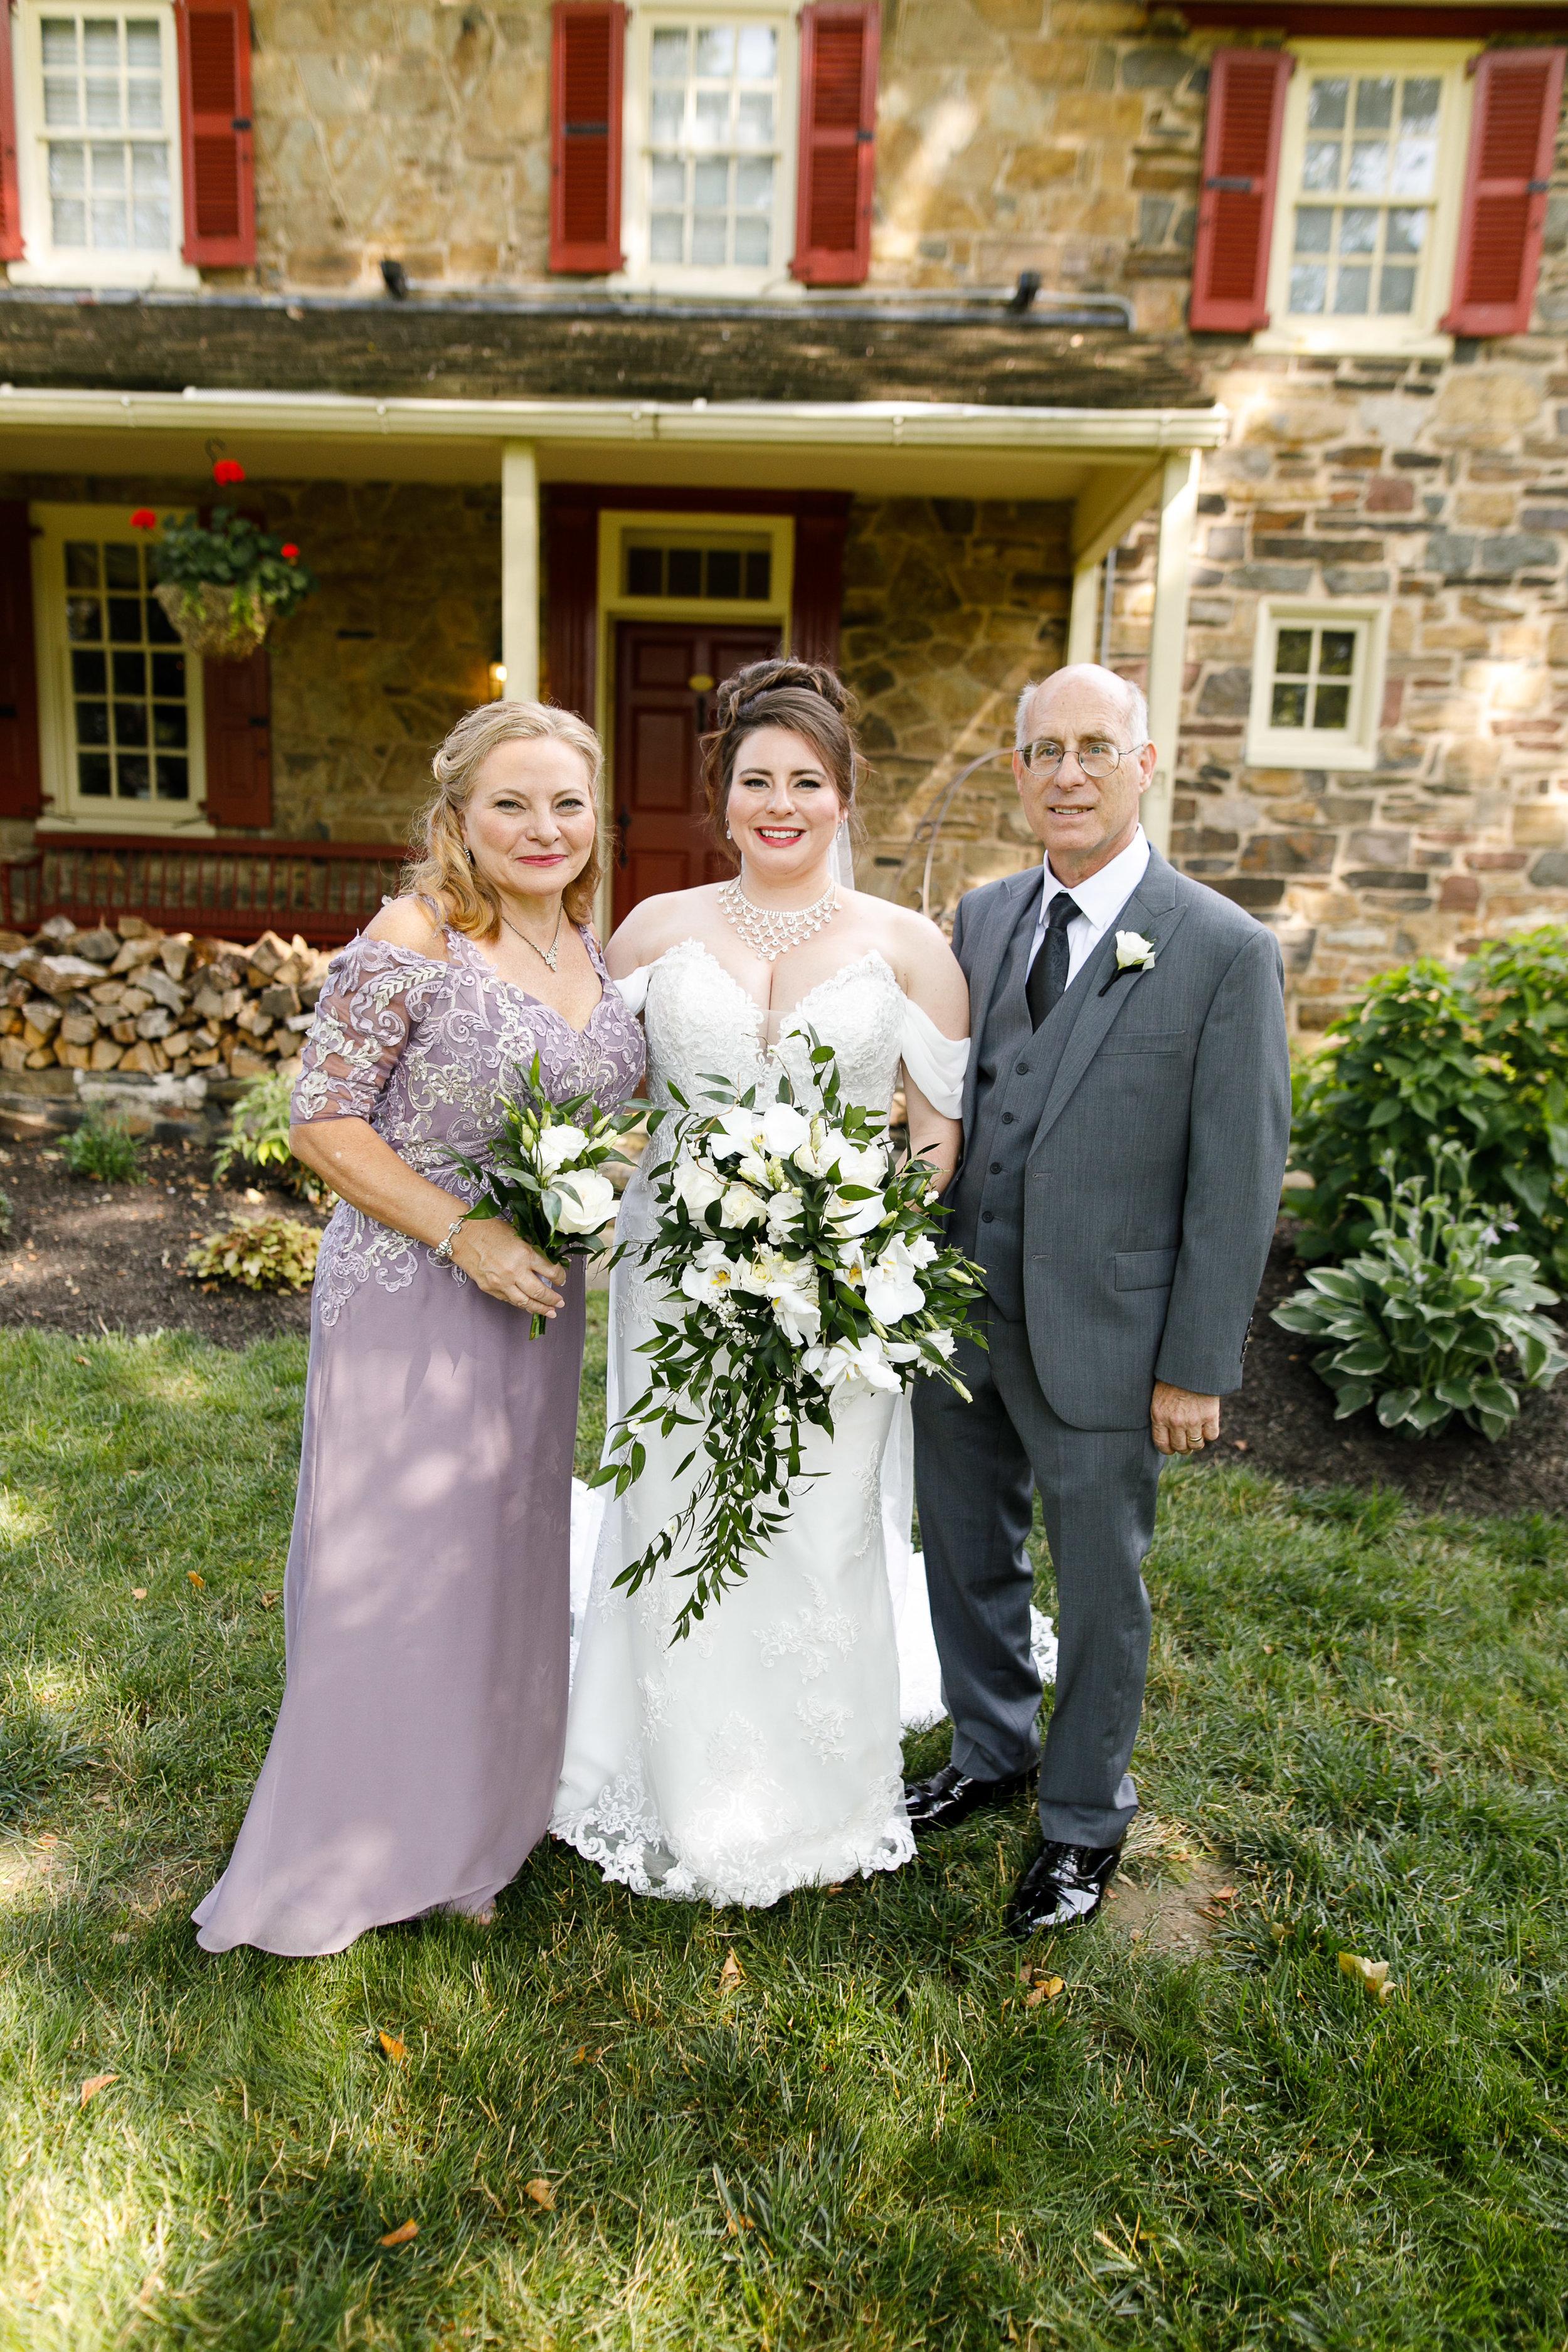 Wedding at Joseph Ambler In Bucks County PA20.jpg